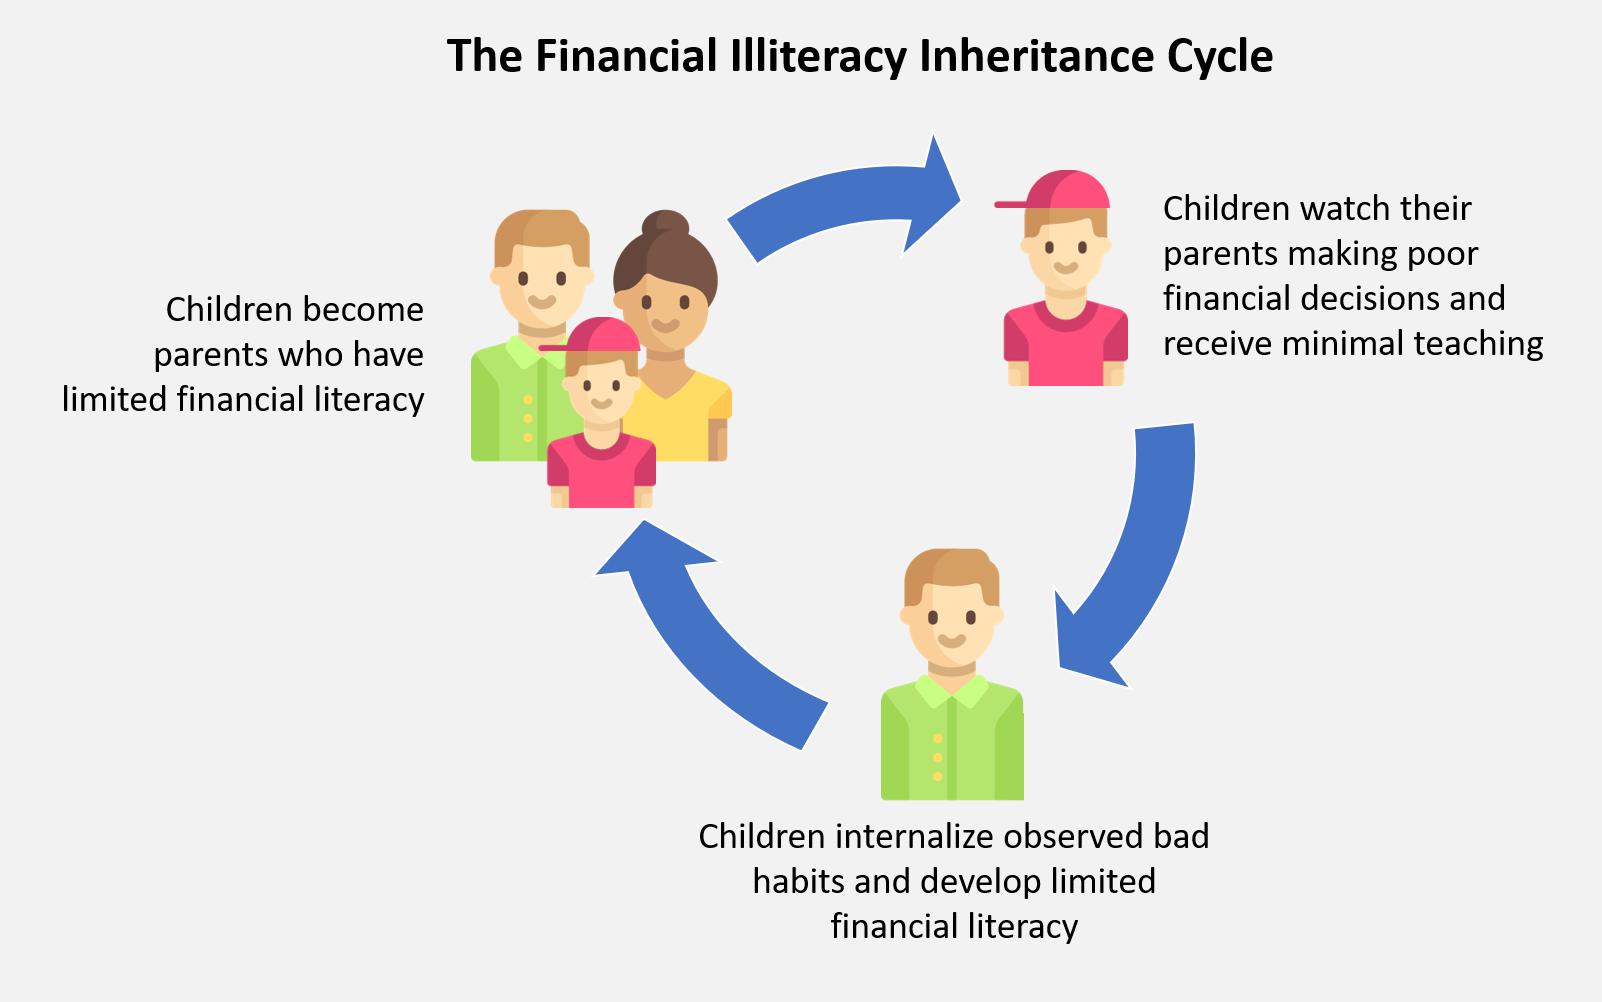 THe Finanacial Illiteracy Inheritance Cycle